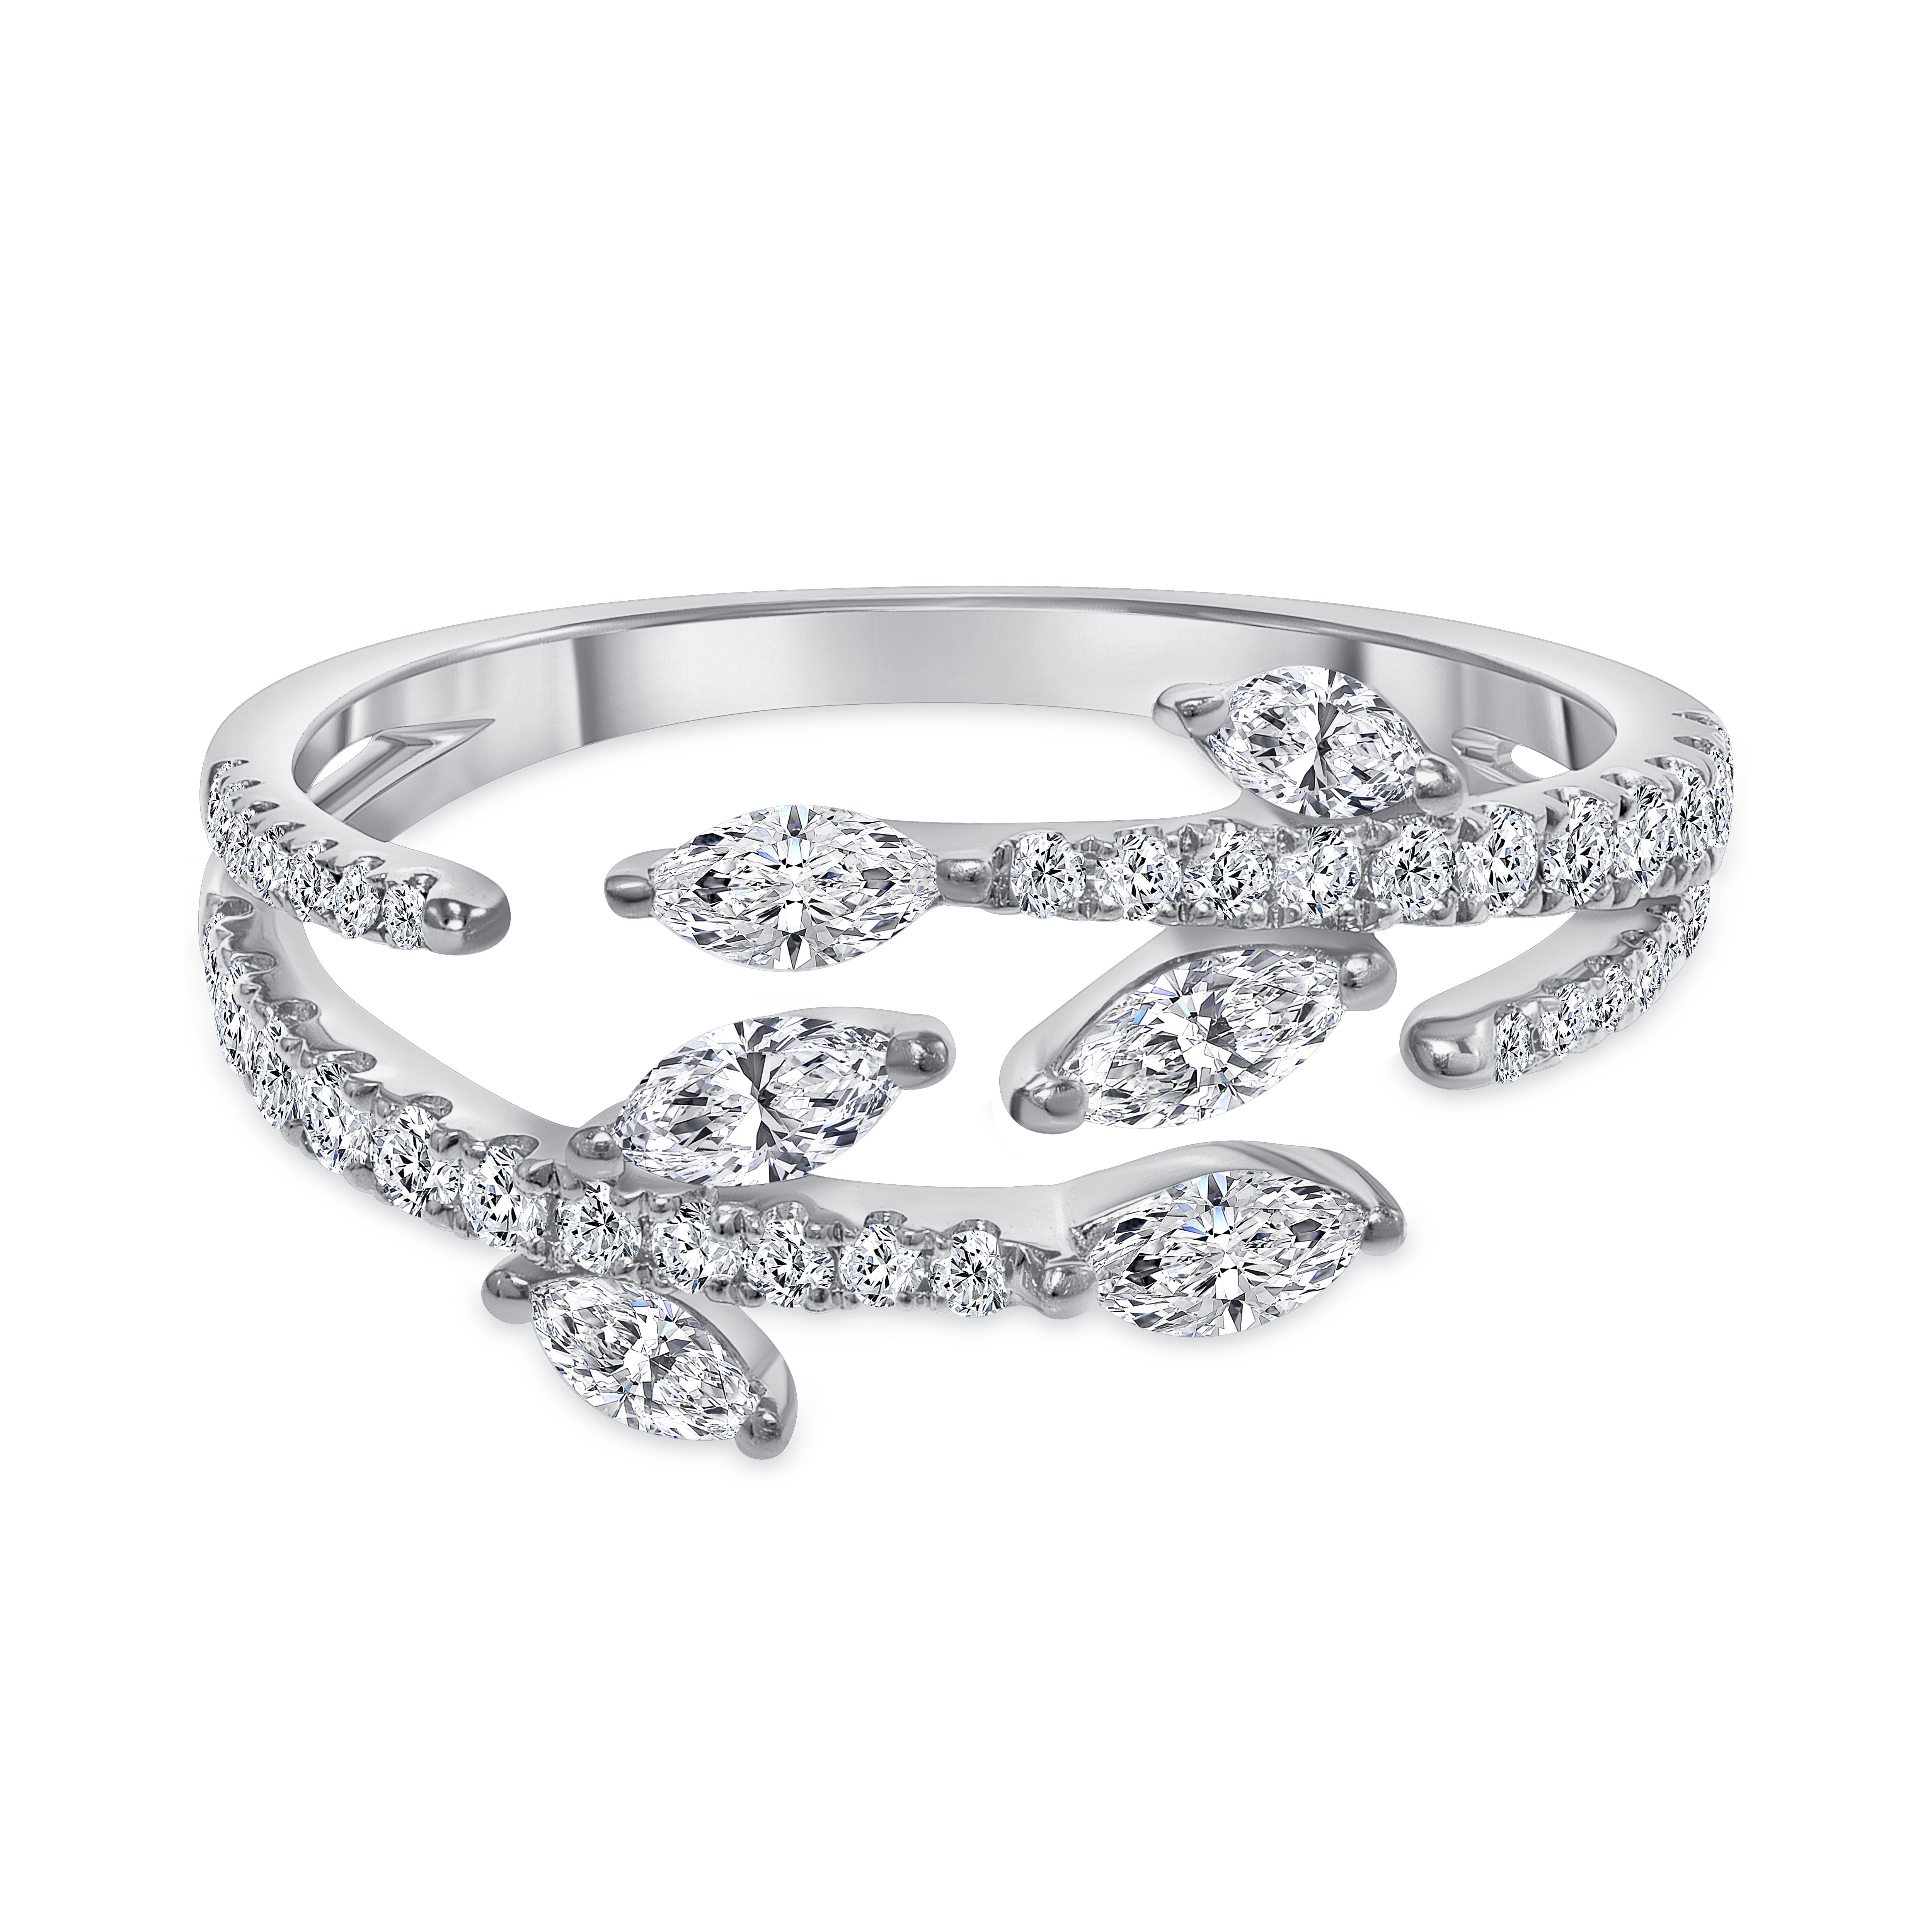 marquise diamond wedding ring in 14k yellow gold | marquise diamond wedding ring in 14k white gold